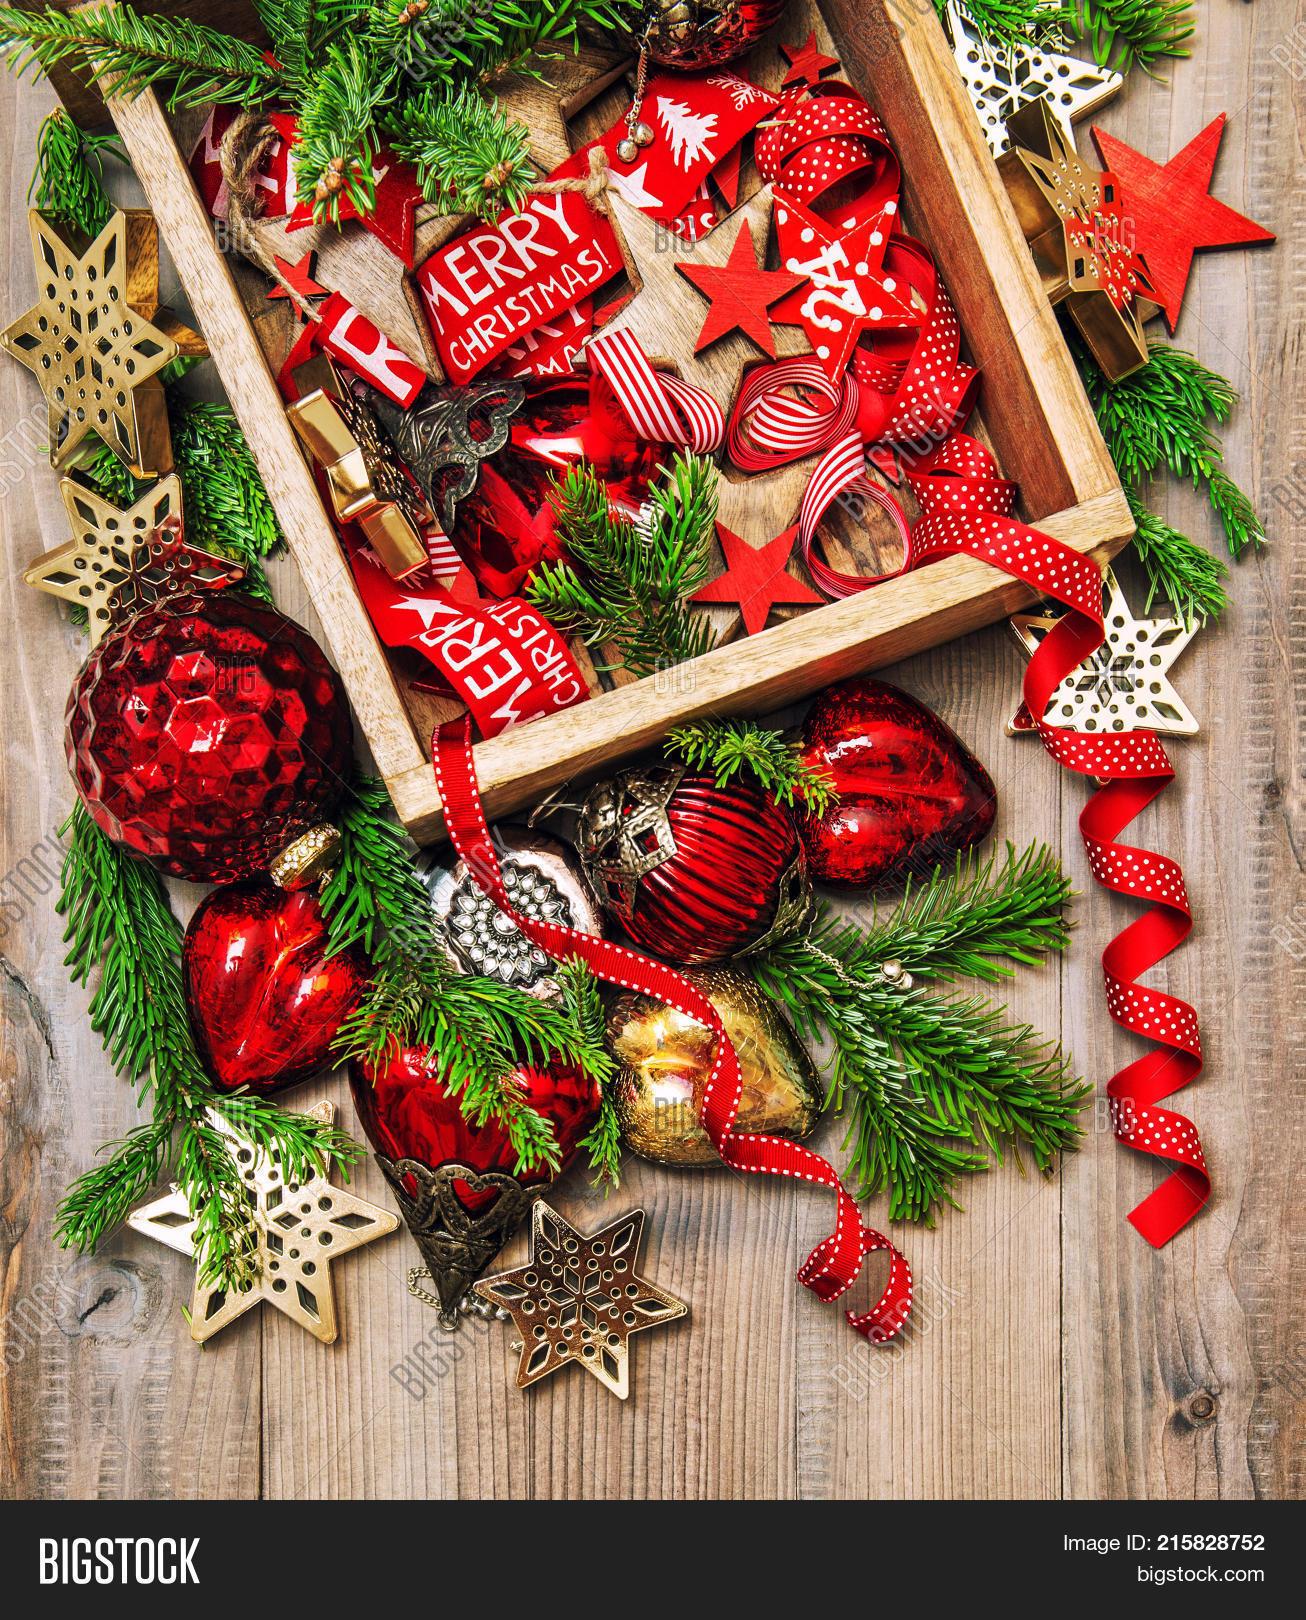 Nostalgic Christmas Image & Photo (Free Trial) | Bigstock